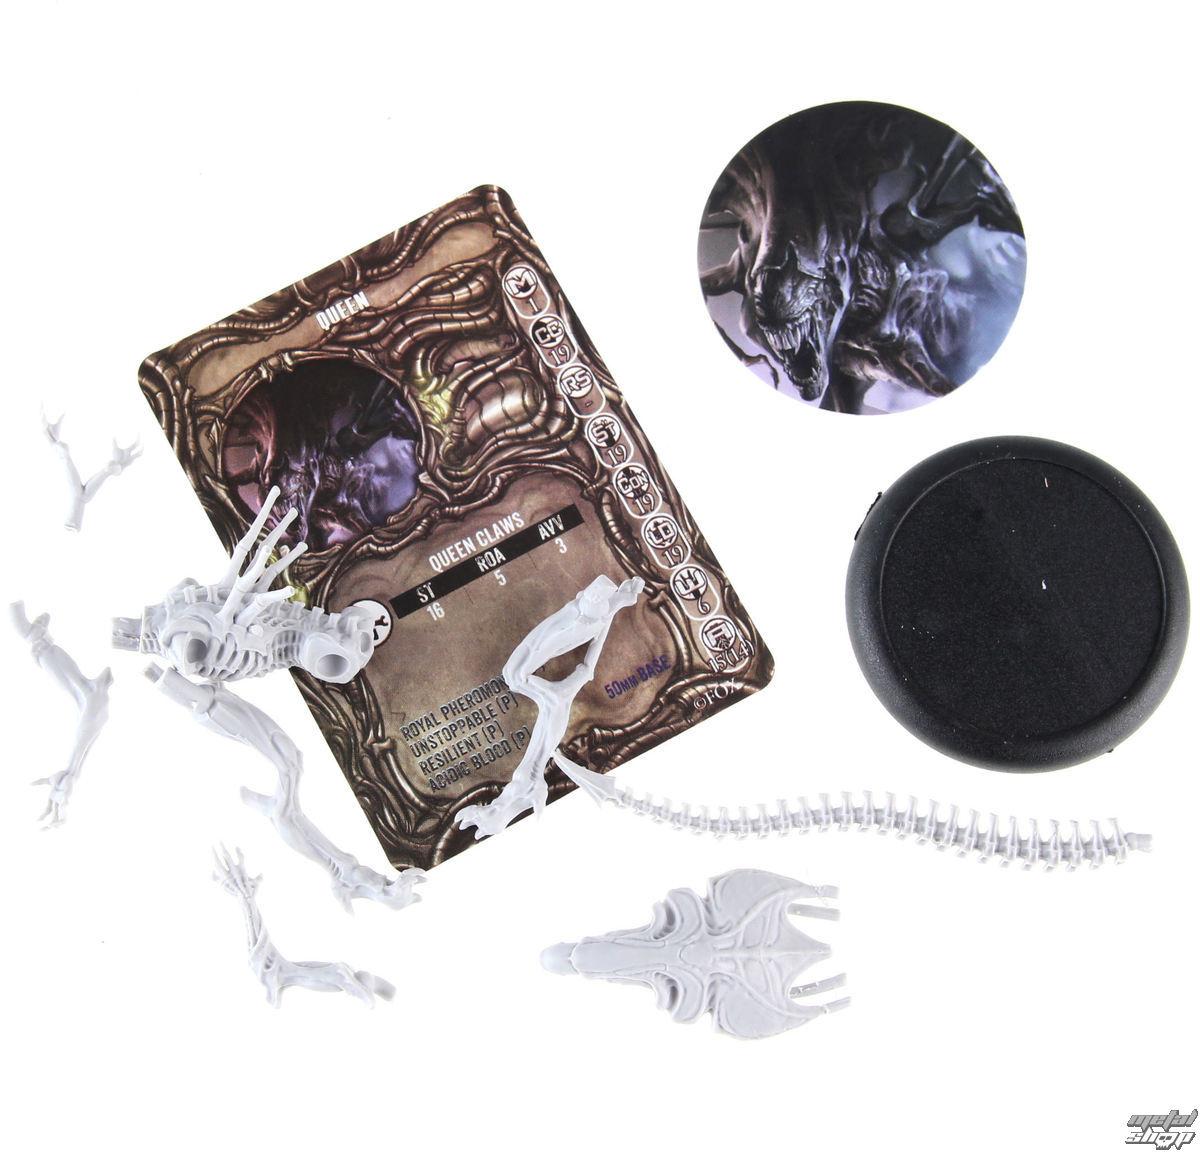 figurka Alien vs Predator (Vetřelec) - Board Game The Hunt Begins Expansion - PRDG16263